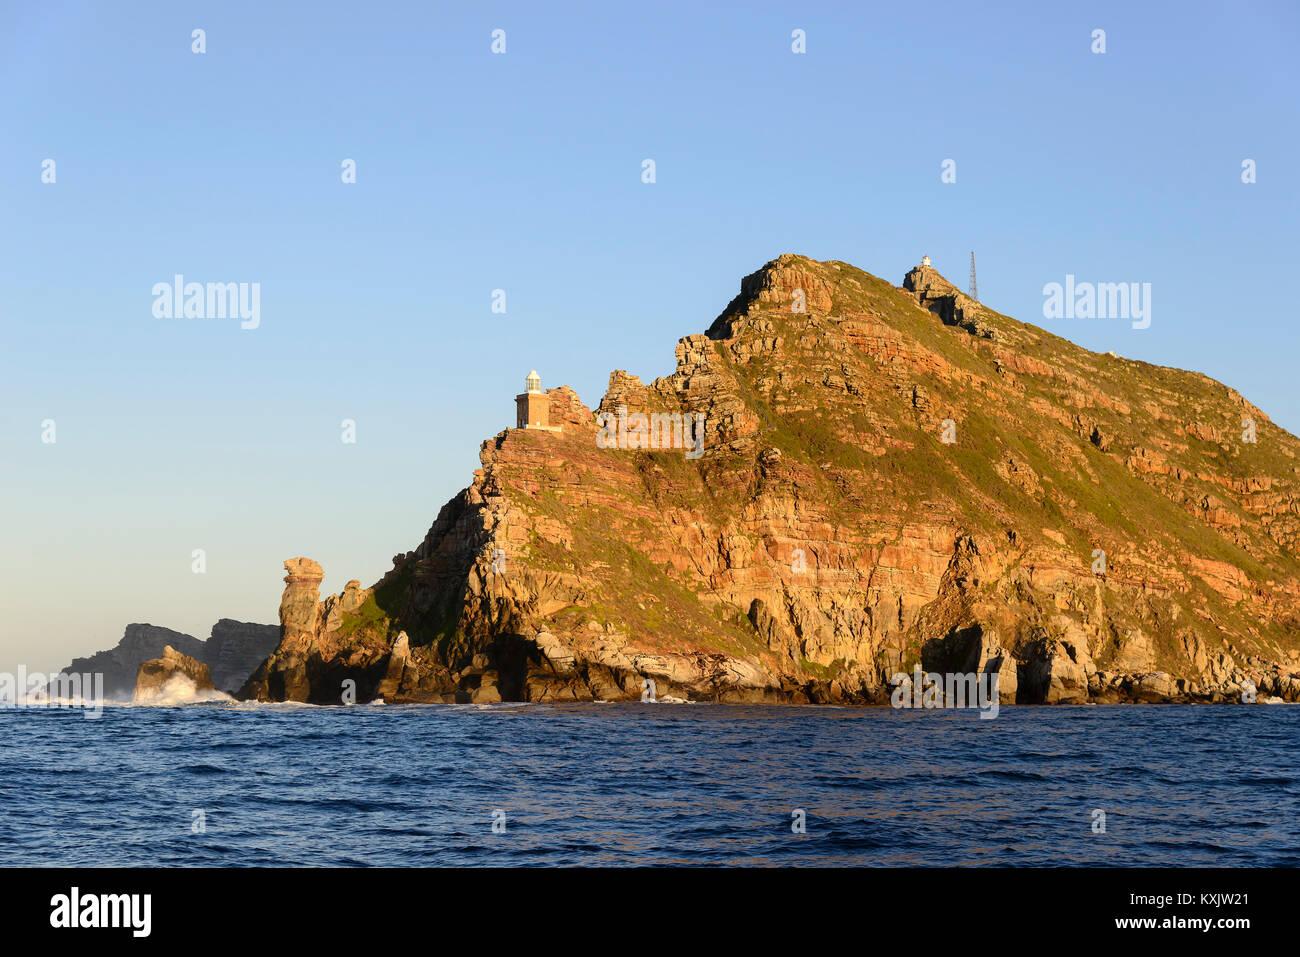 Cape of good Hope, South Africa, Indian Ocean and Atlantic Ocean - Stock Image